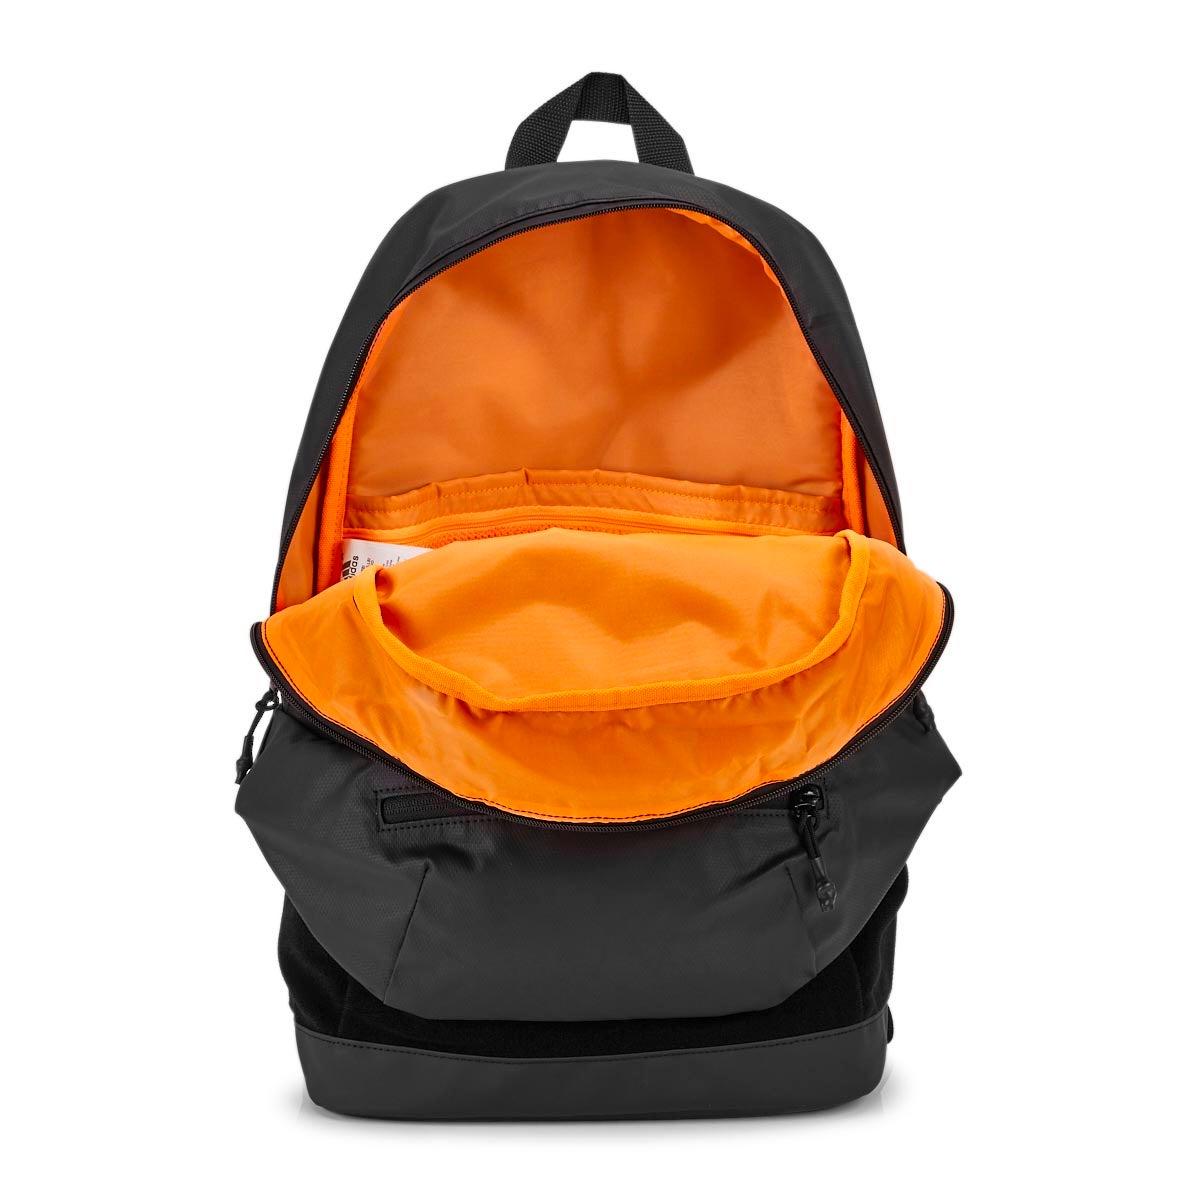 Adidas Clas BP Adapt blk/blk backpack